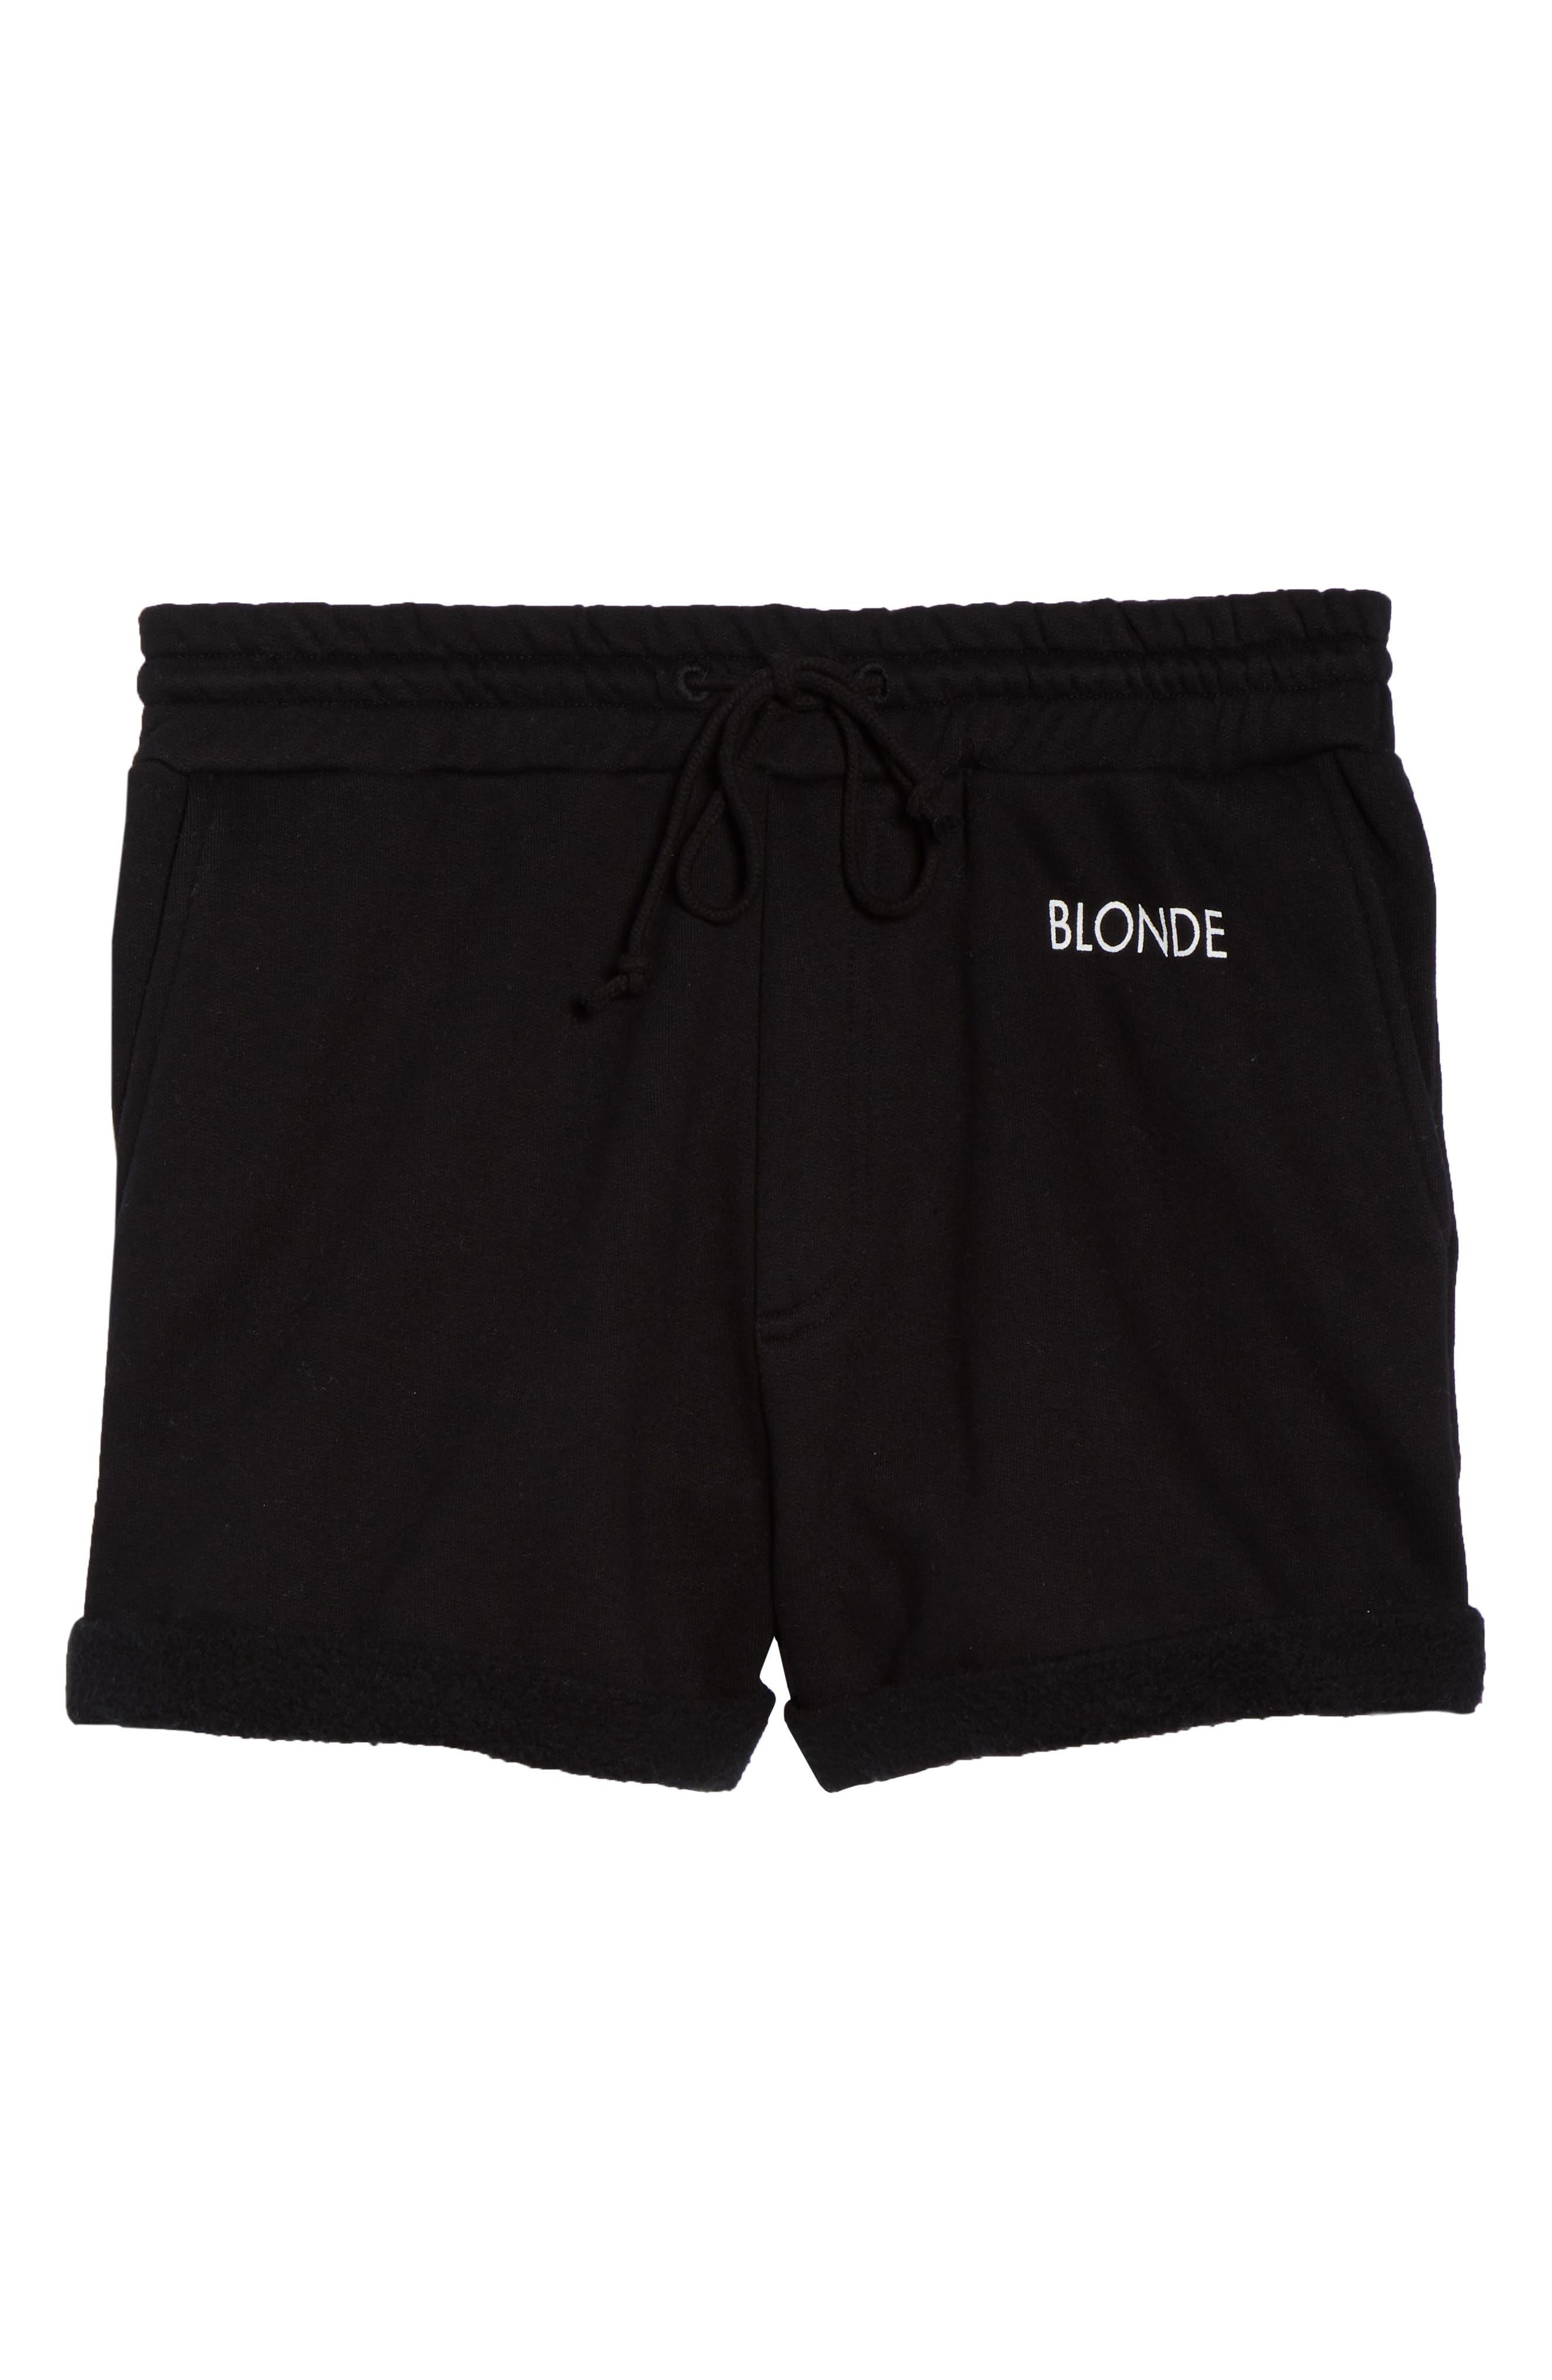 Blonde Lounge Shorts,                             Alternate thumbnail 6, color,                             008